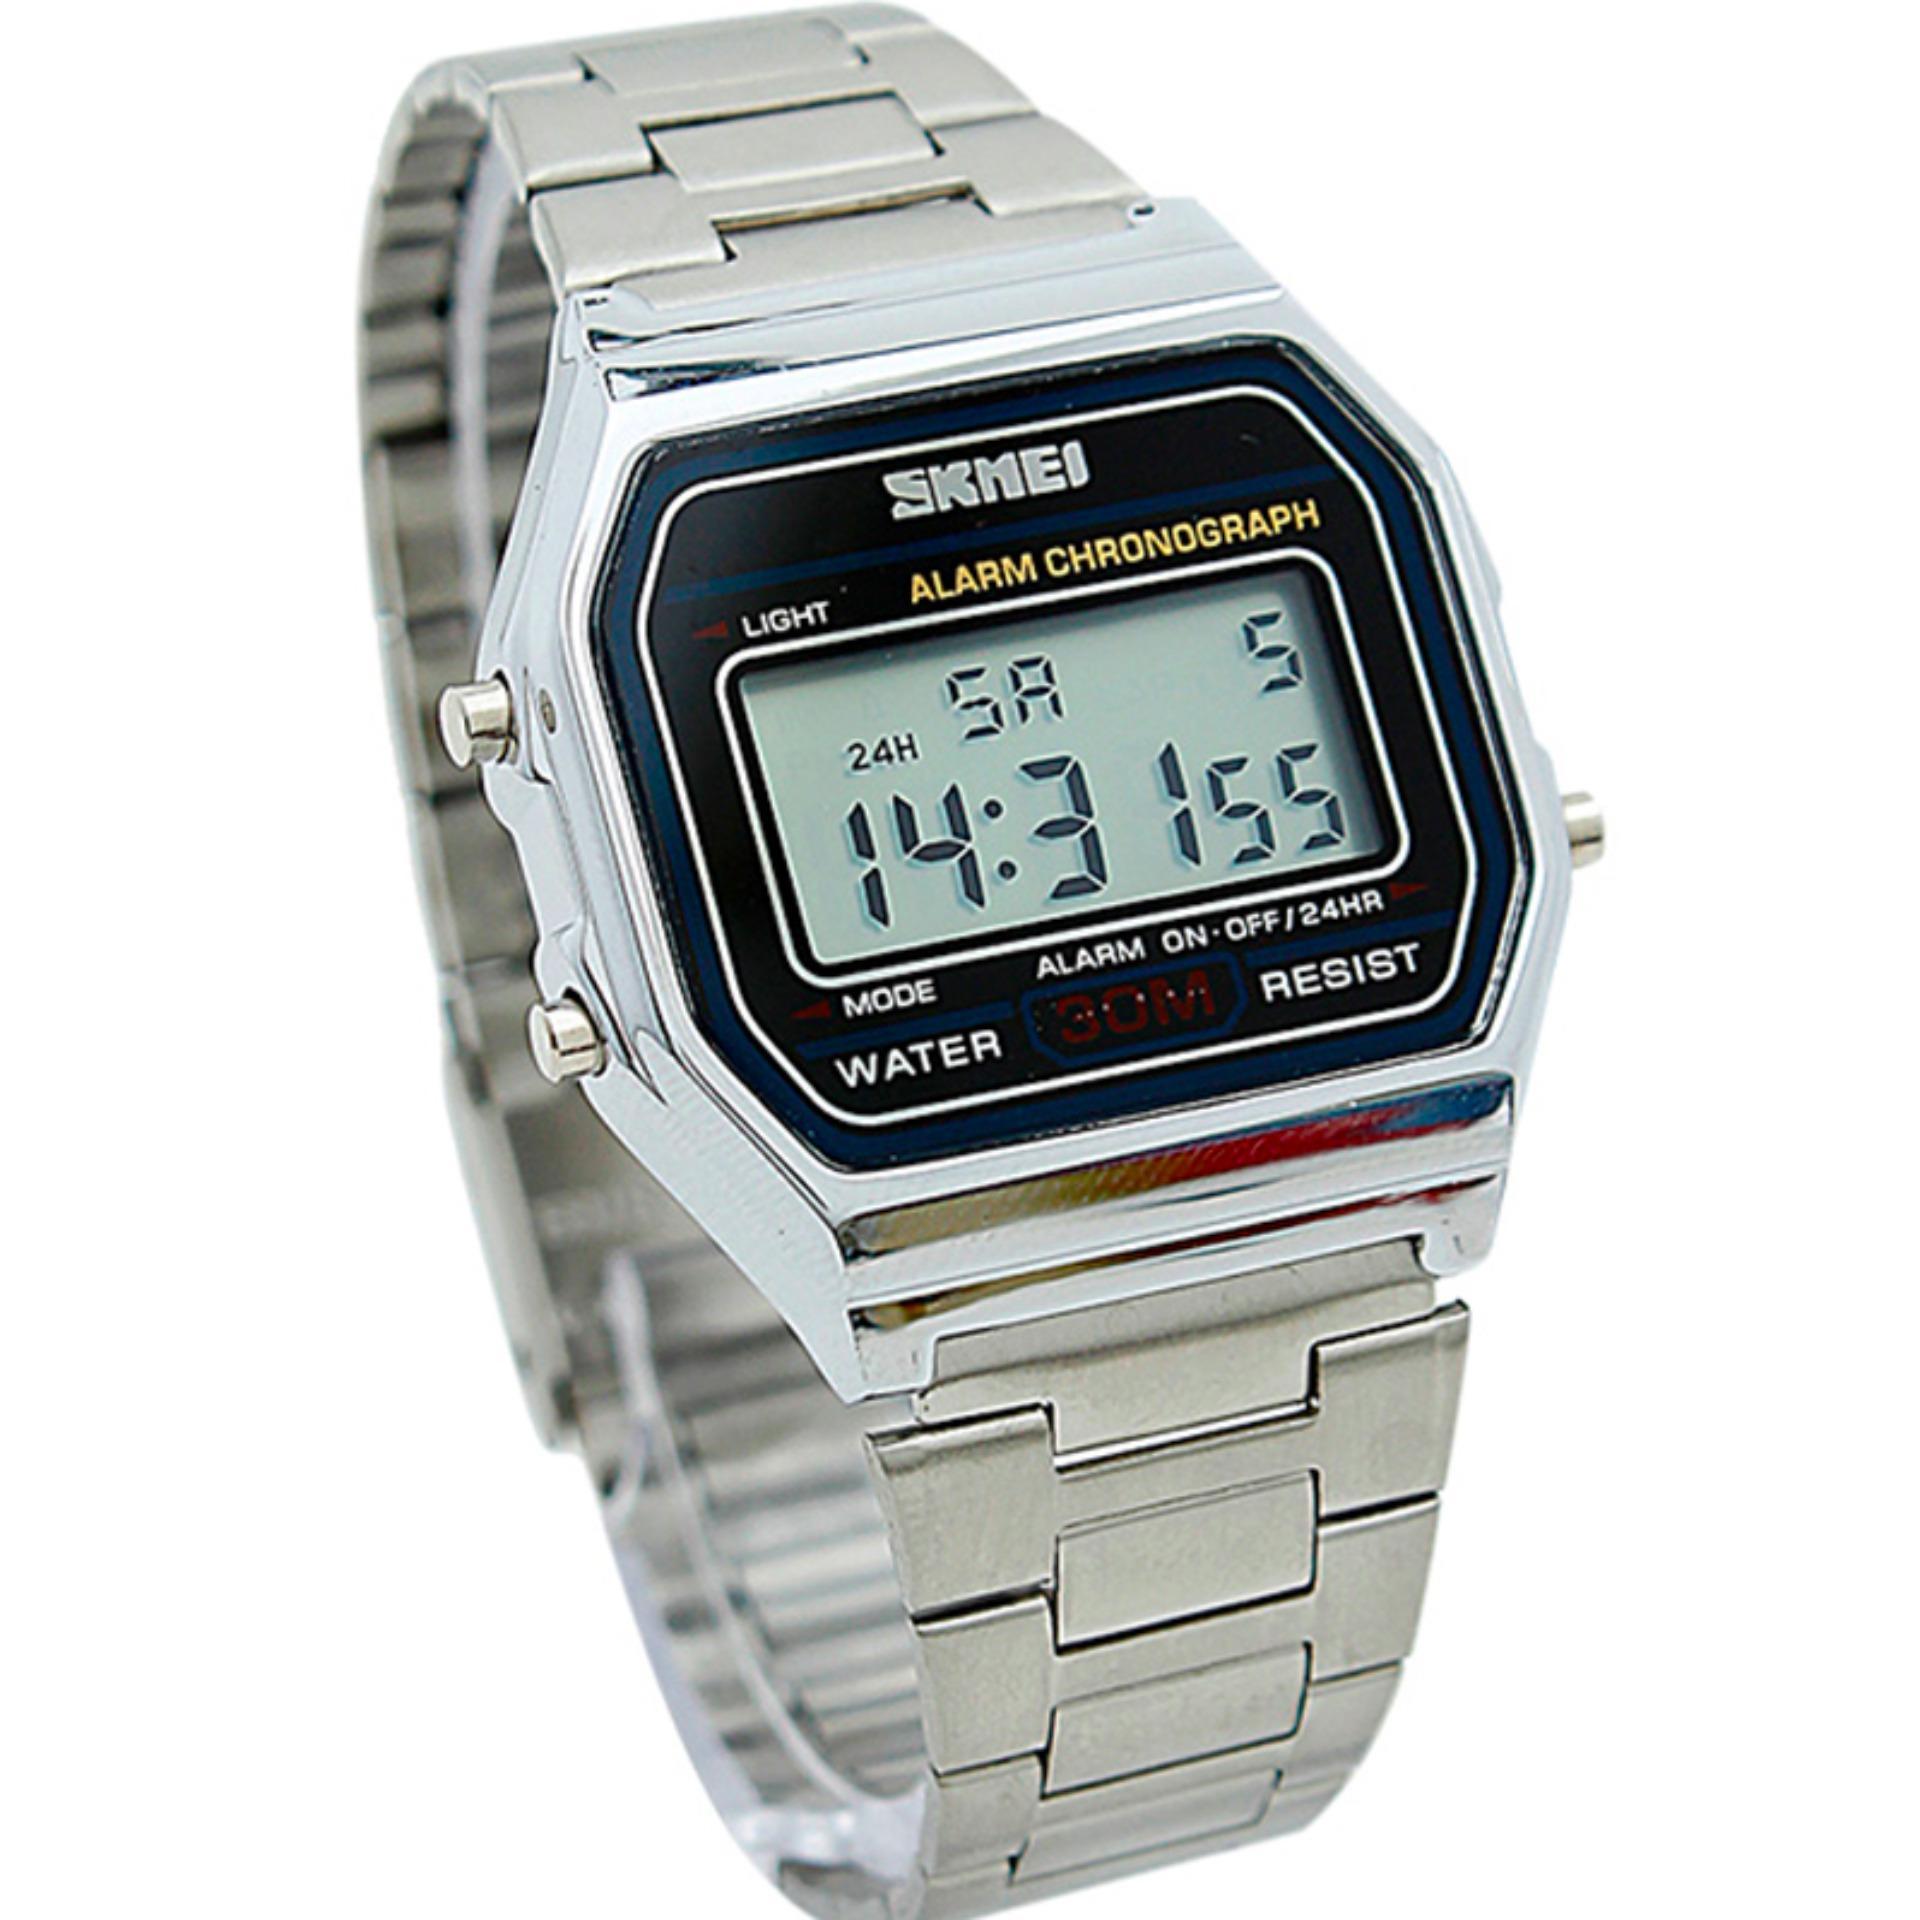 SKMEI Casio Man Sport LED Watch Water Resistant 30m DG1123 Waterproof Analog DIgital GARANSI RESMI